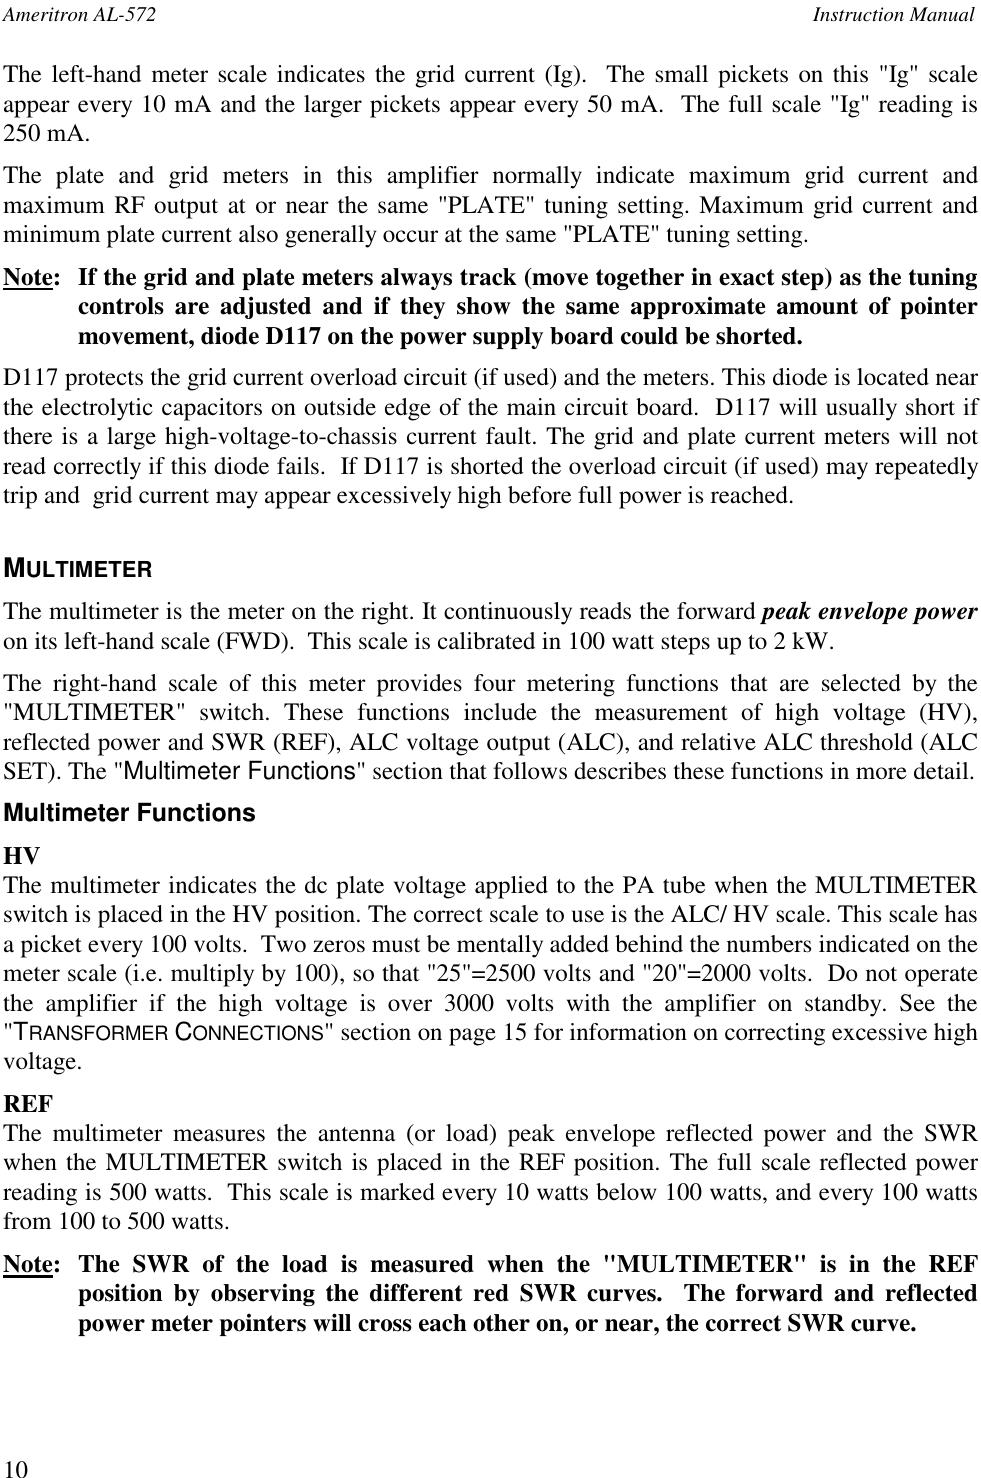 AL572 AMERITRON AL 572 User Manual